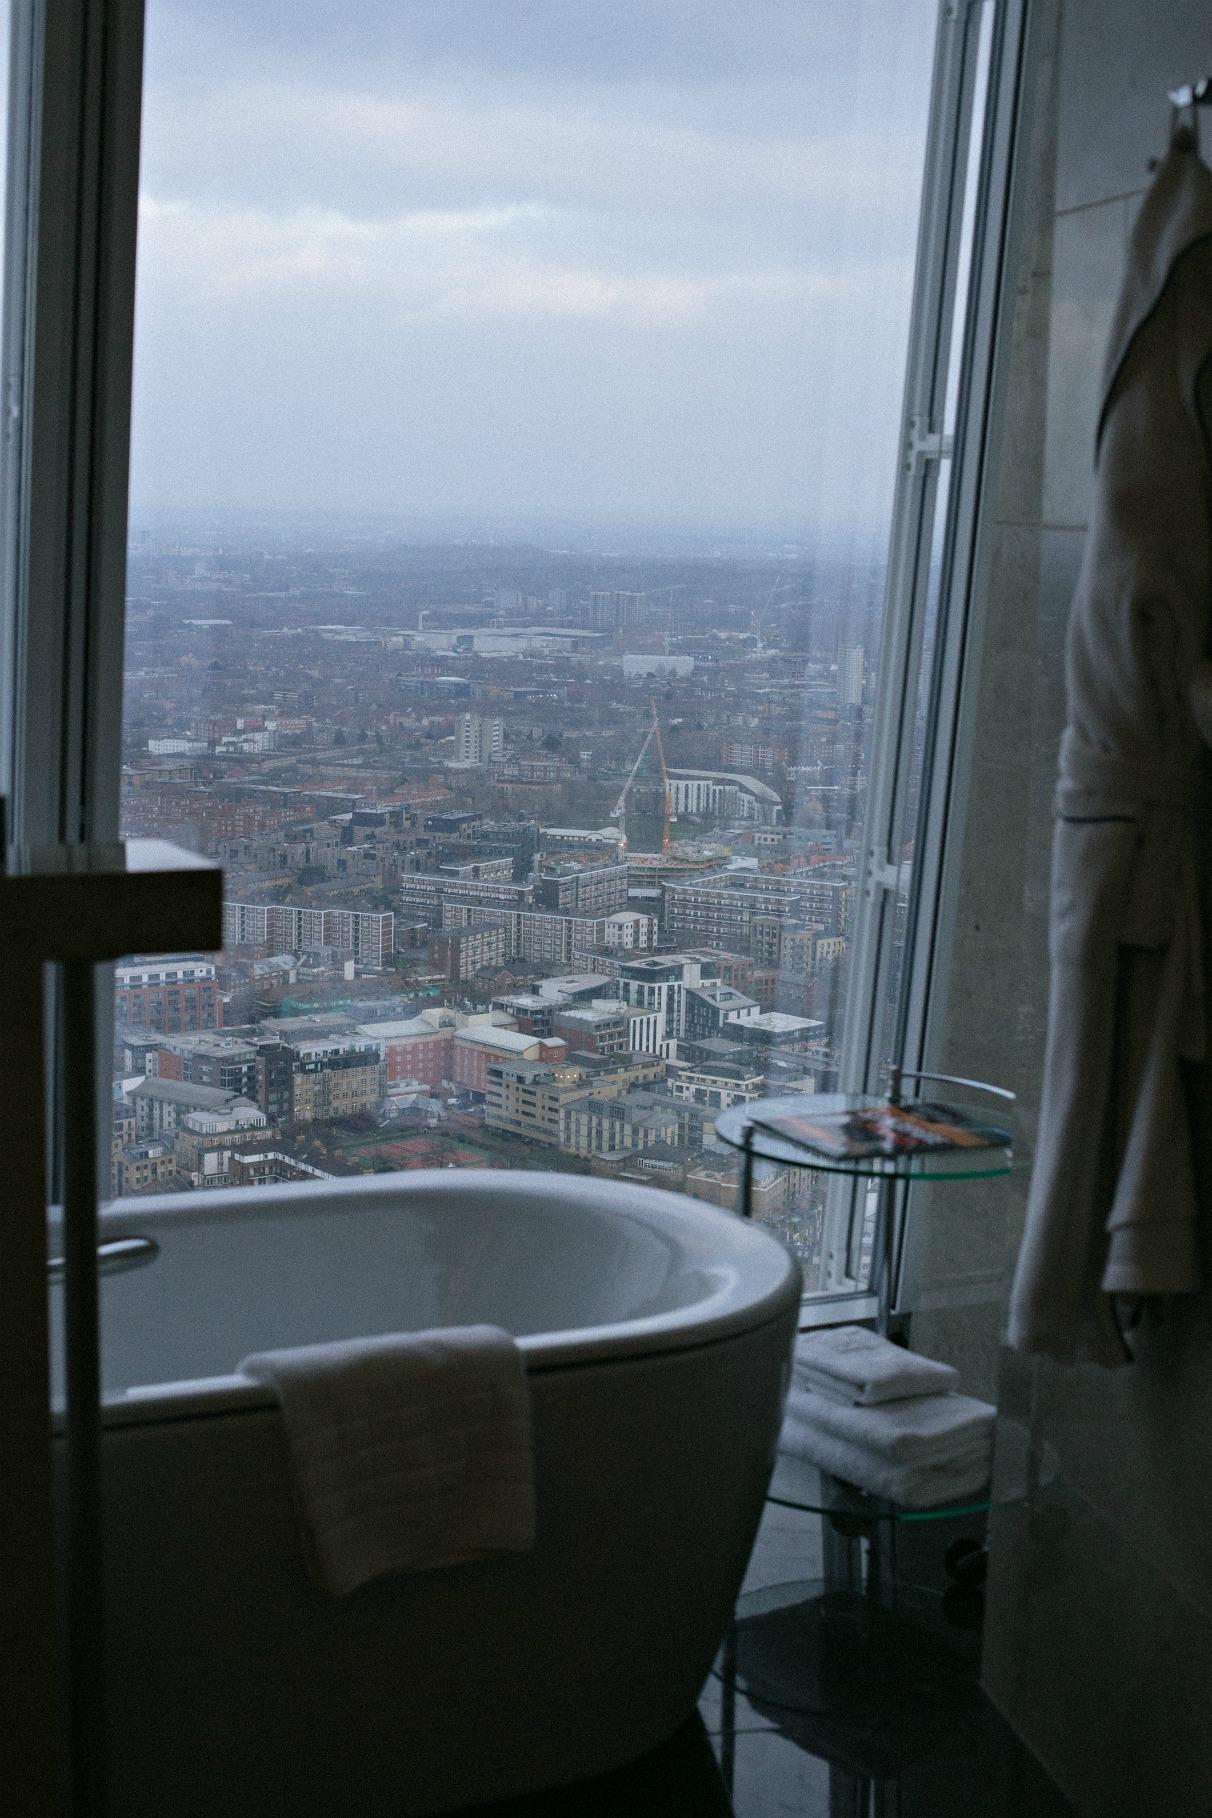 disi-couture-travel-shangri-la-hotel-shard-london-tower-bridge-england-edisa-shahini-07